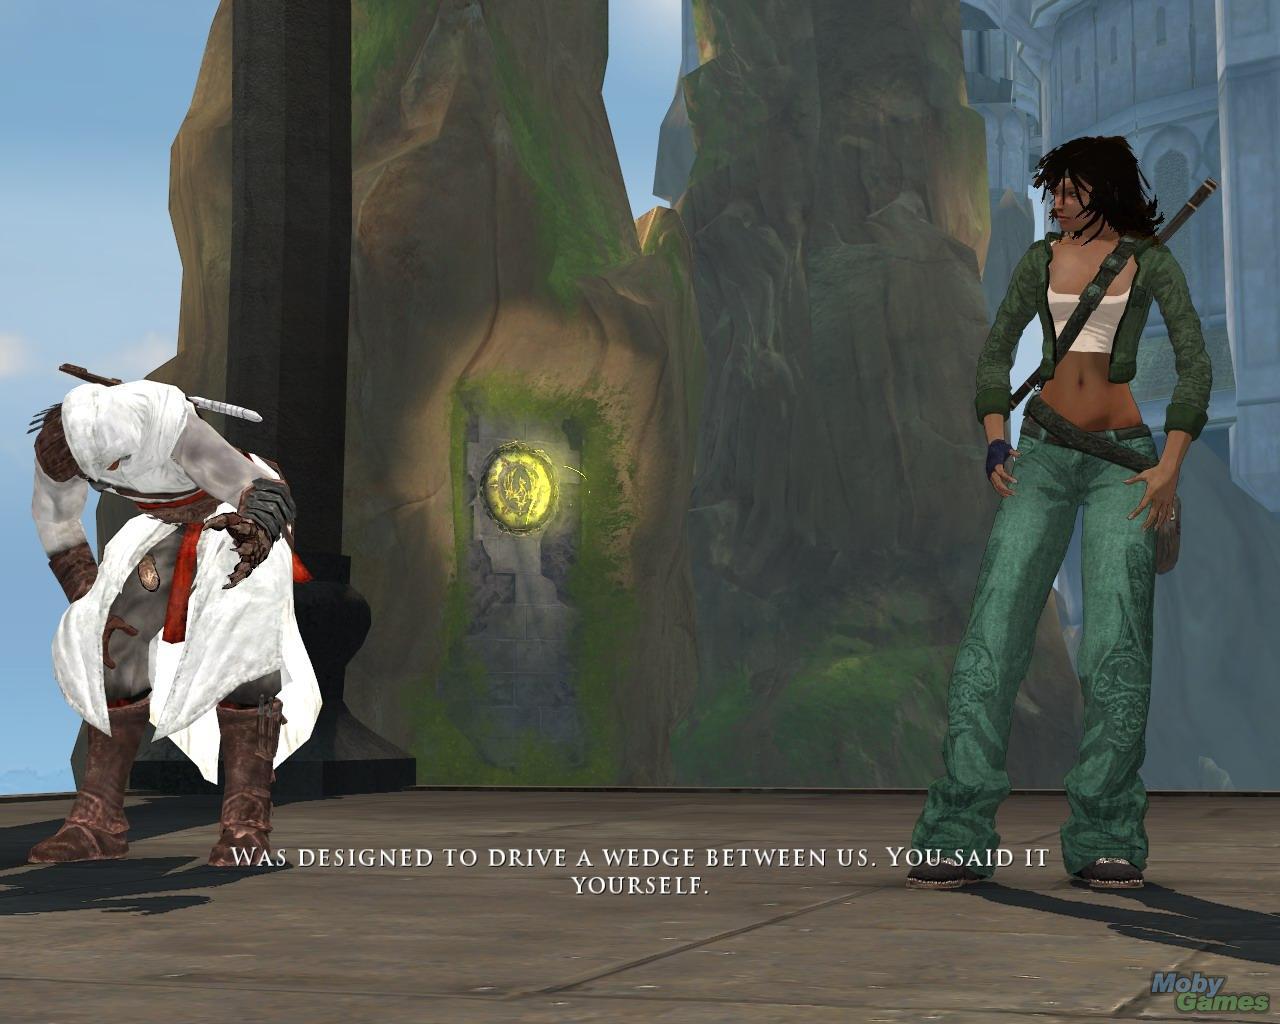 Free Download Prince Of Persia 2008 Screenshot Prince Of Persia